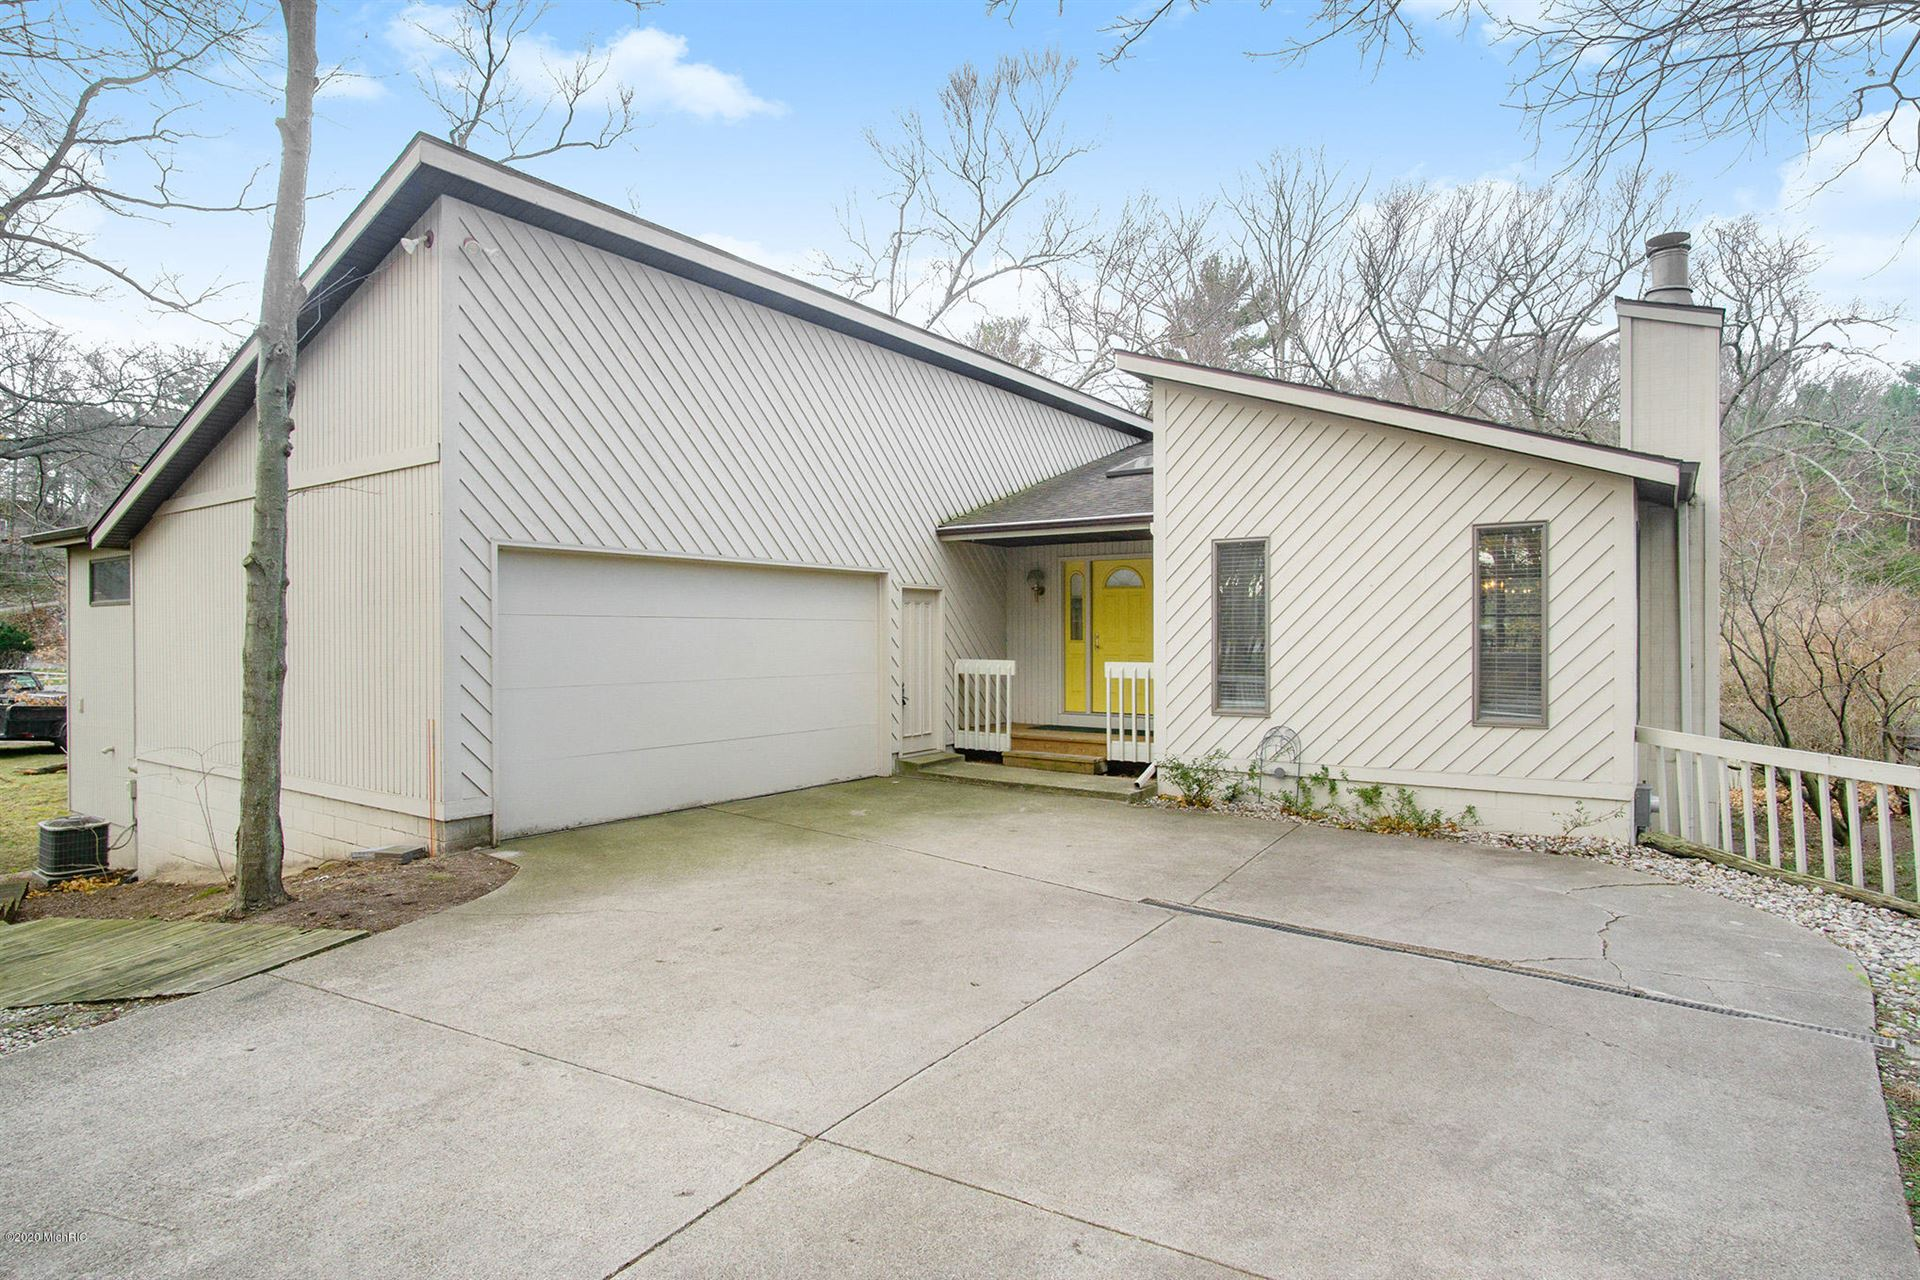 Photo of 1625 Pineridge Drive, Grand Haven, MI 49417 (MLS # 20041708)